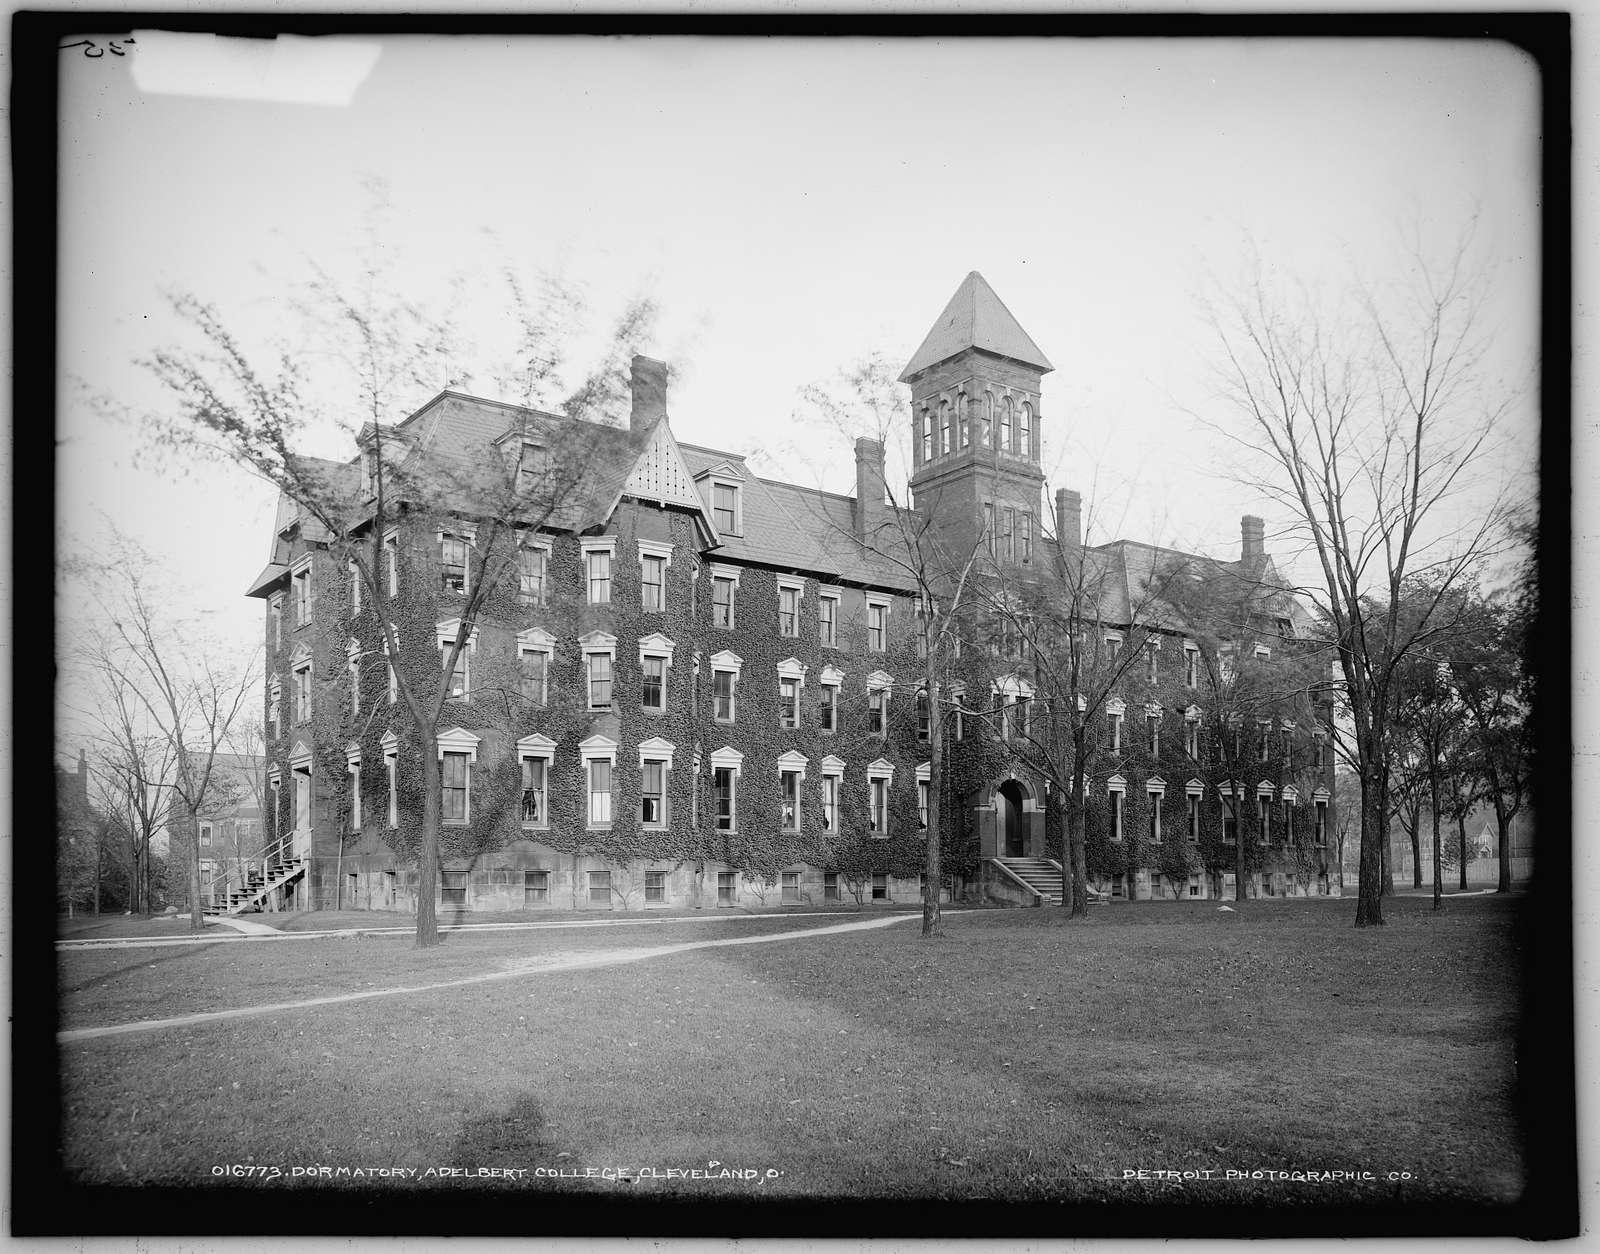 Dormatory sic, Adelbert College, Cleveland, Ohio